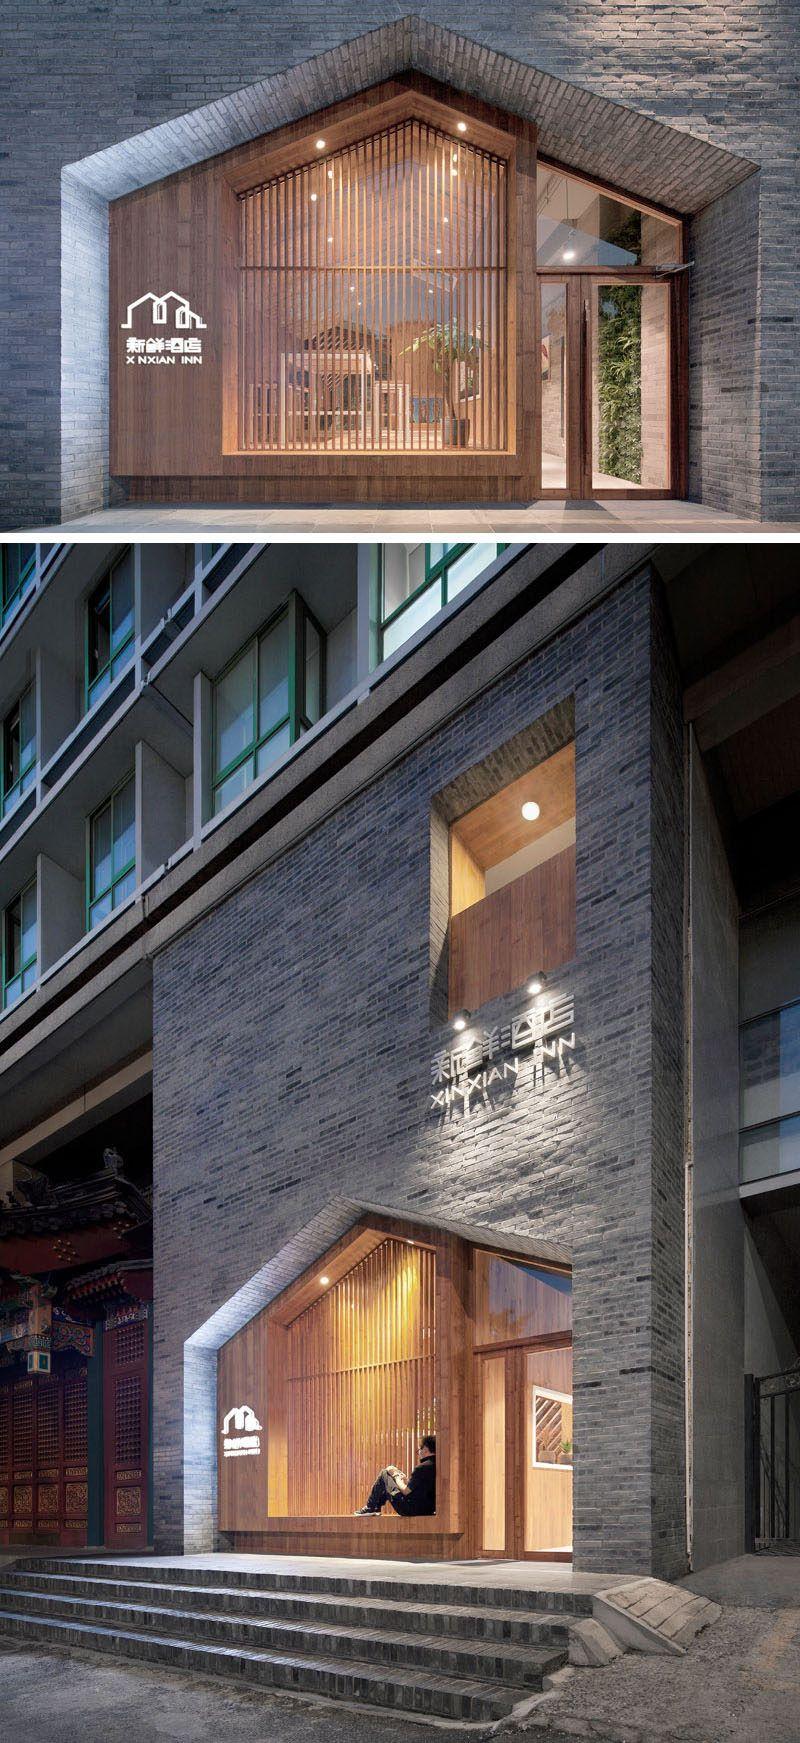 Exterior modern siding window design  gray bricks and wood work together to create a contemporary facade